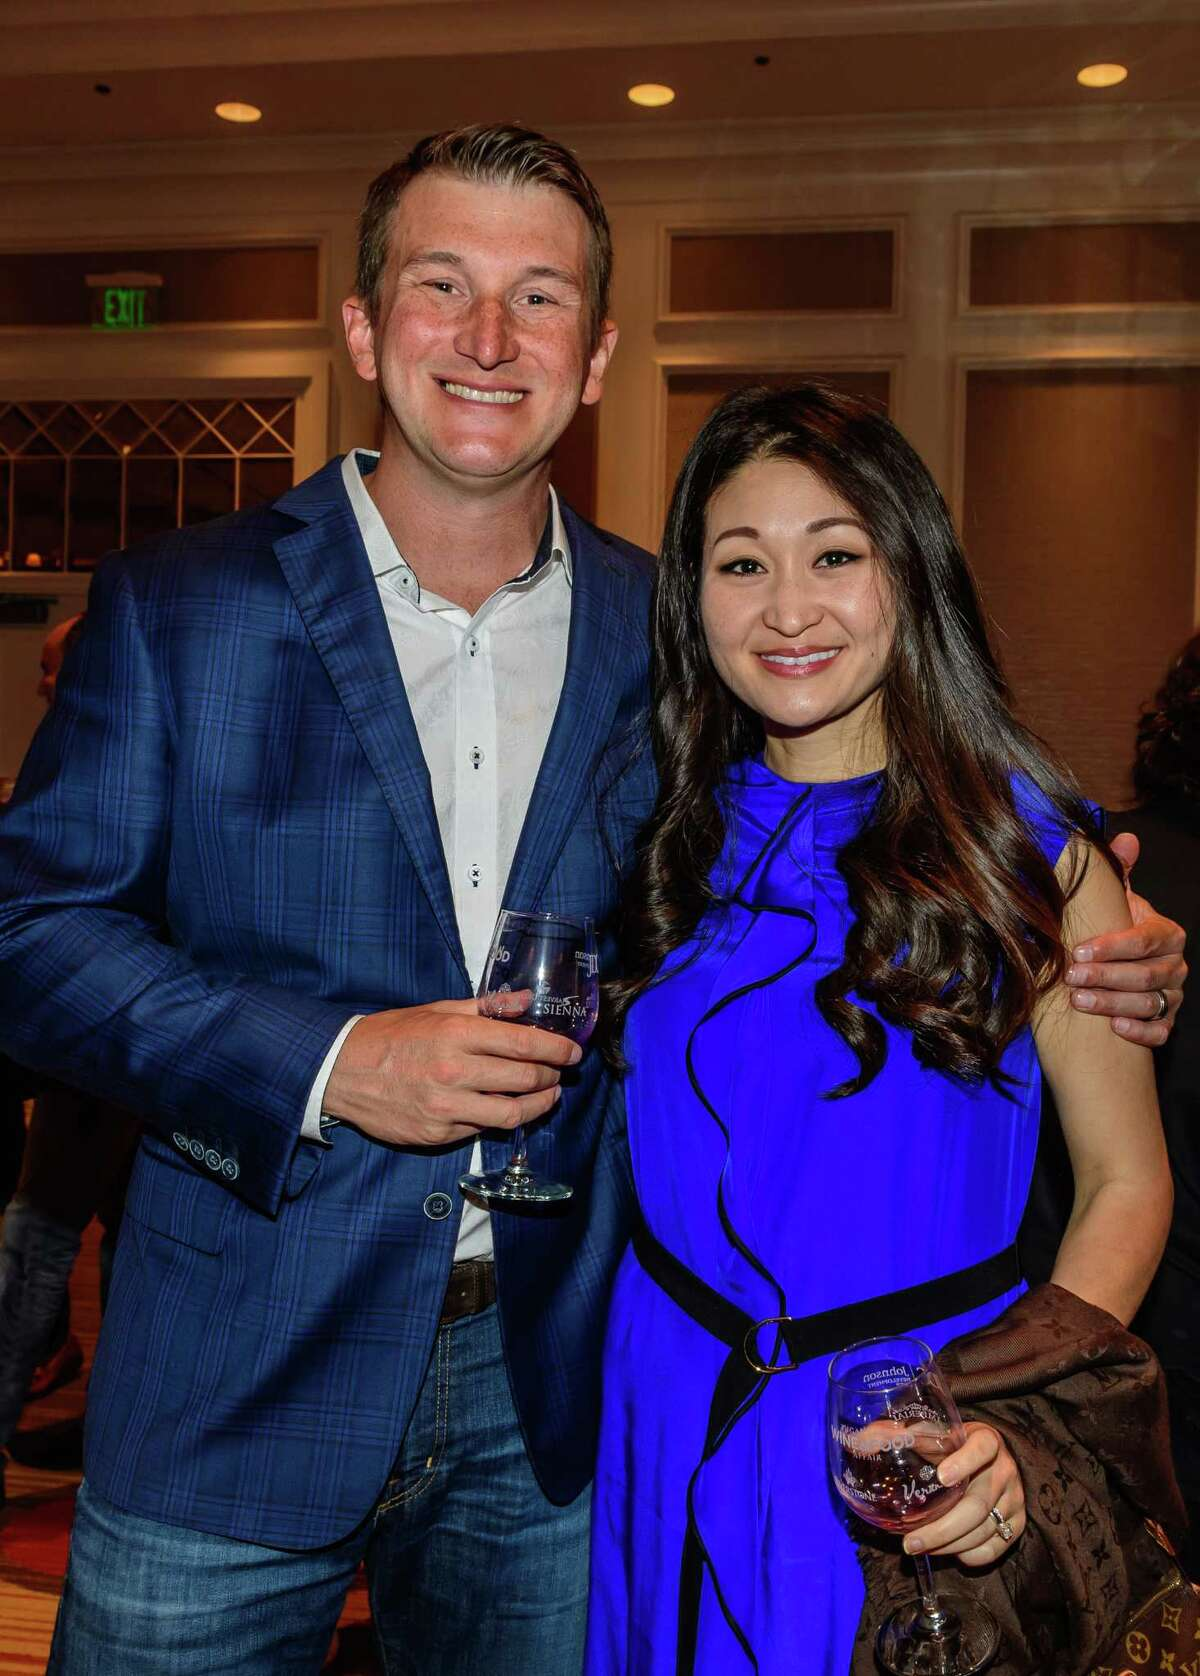 Adam and Susan Gonzales enjoy the Sugar Land Wine & Food Affair's Grand Tasting held in the Sugar Land Marriott ballroom, 04/07/17.